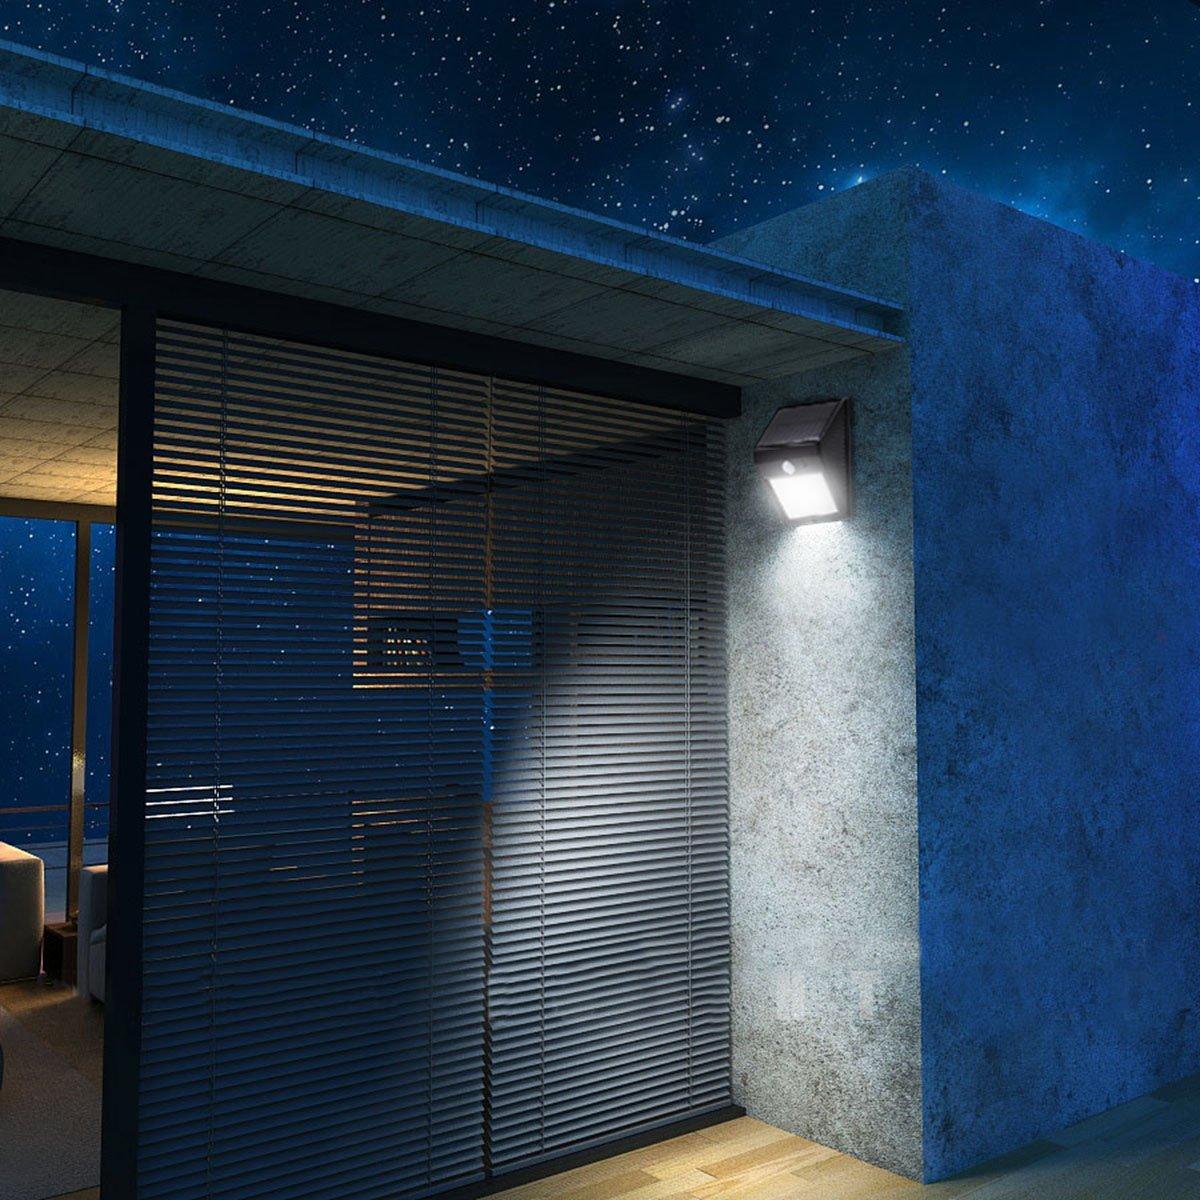 Lâmpadas Solares dcoo solar 20 leds sensor Features : Waterproof